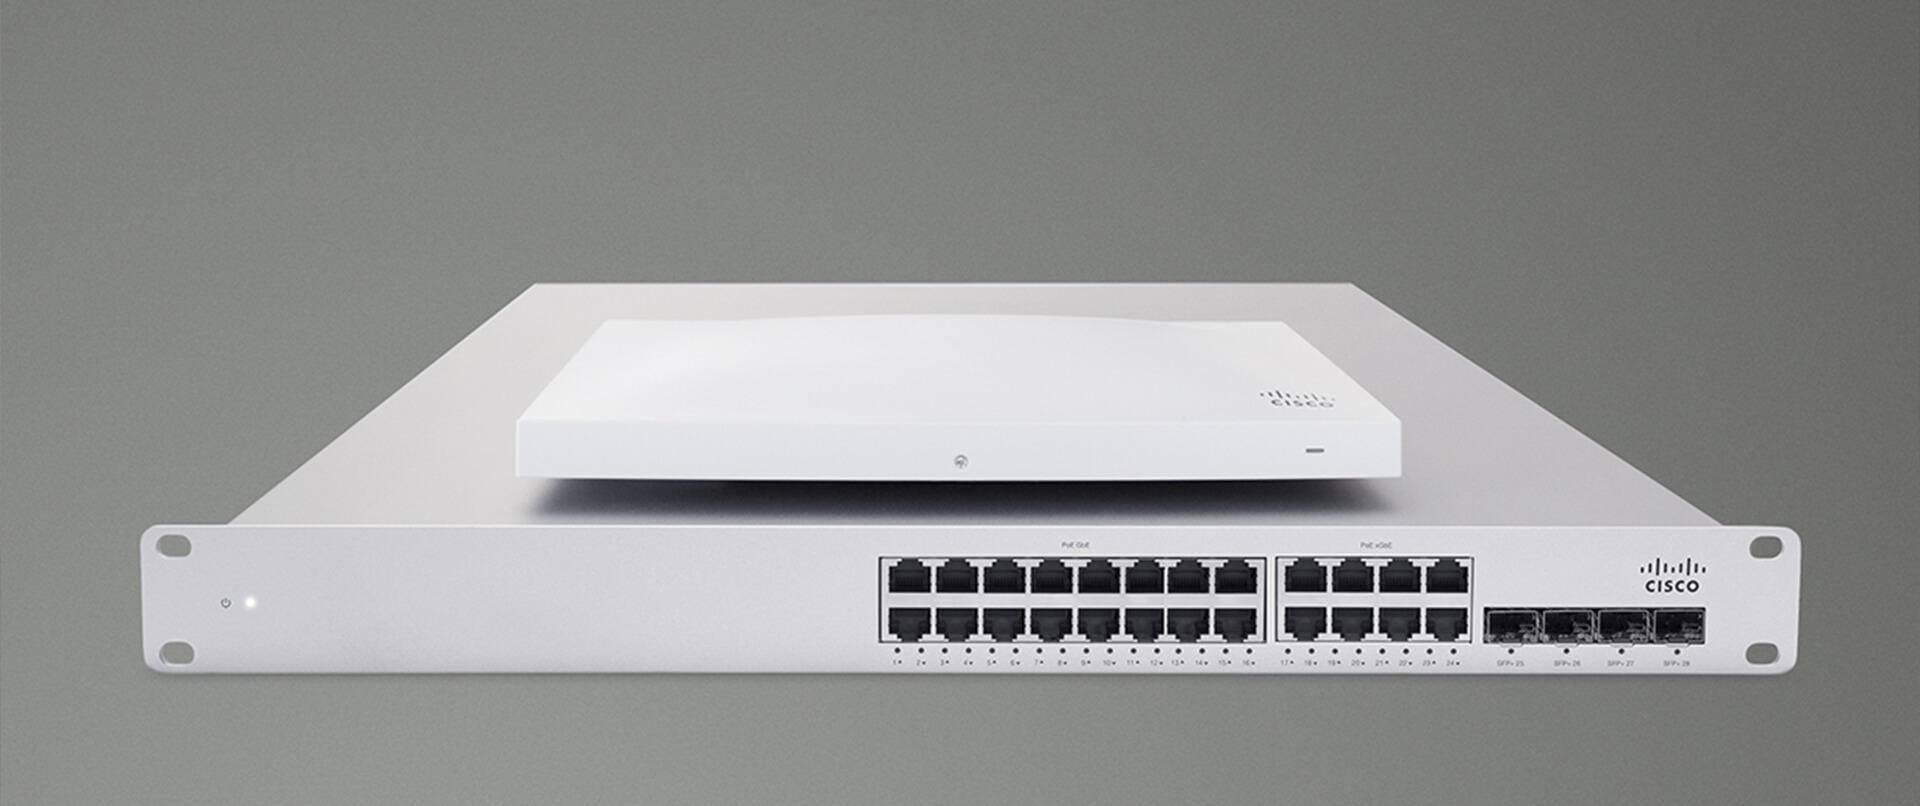 Cisco Cloud managed switch - AP